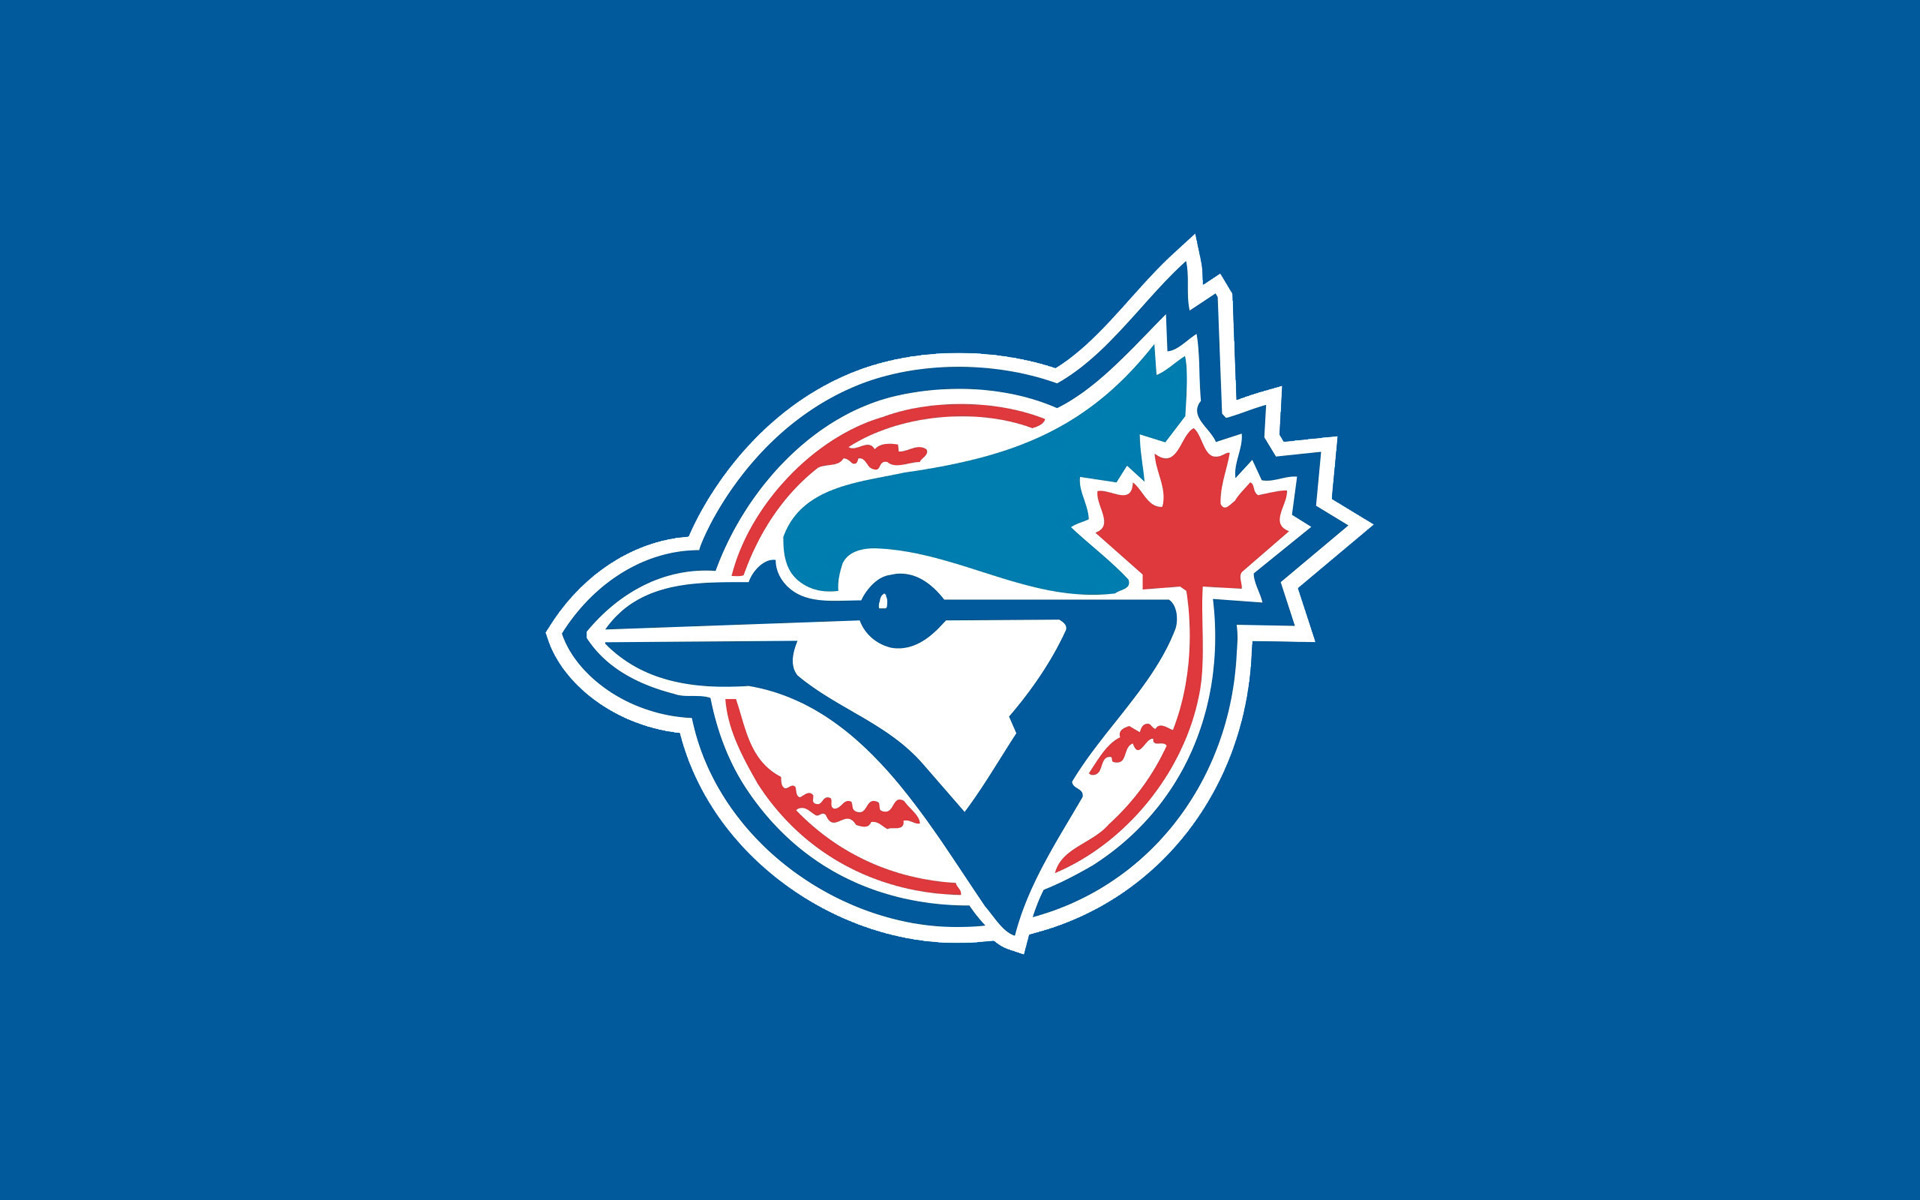 Wallpaper Toronto Blue Jays Logo HD Wallpaper Upload at April 27 1920x1200